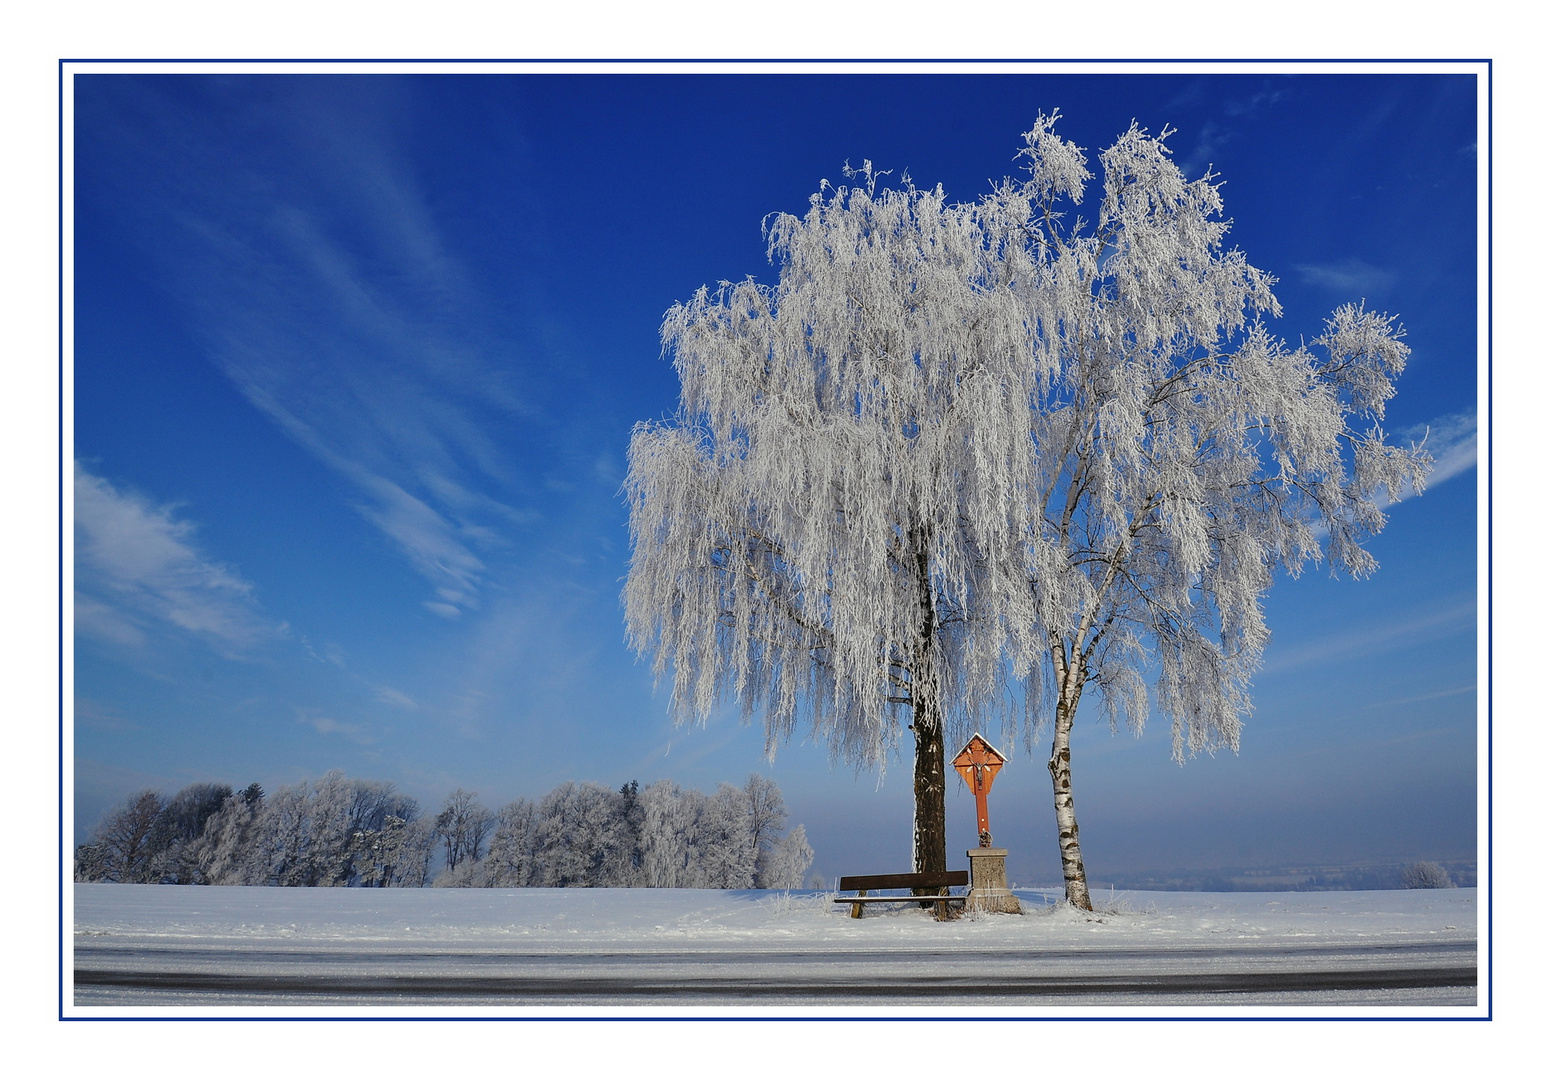 Wintertag in Niederbayern